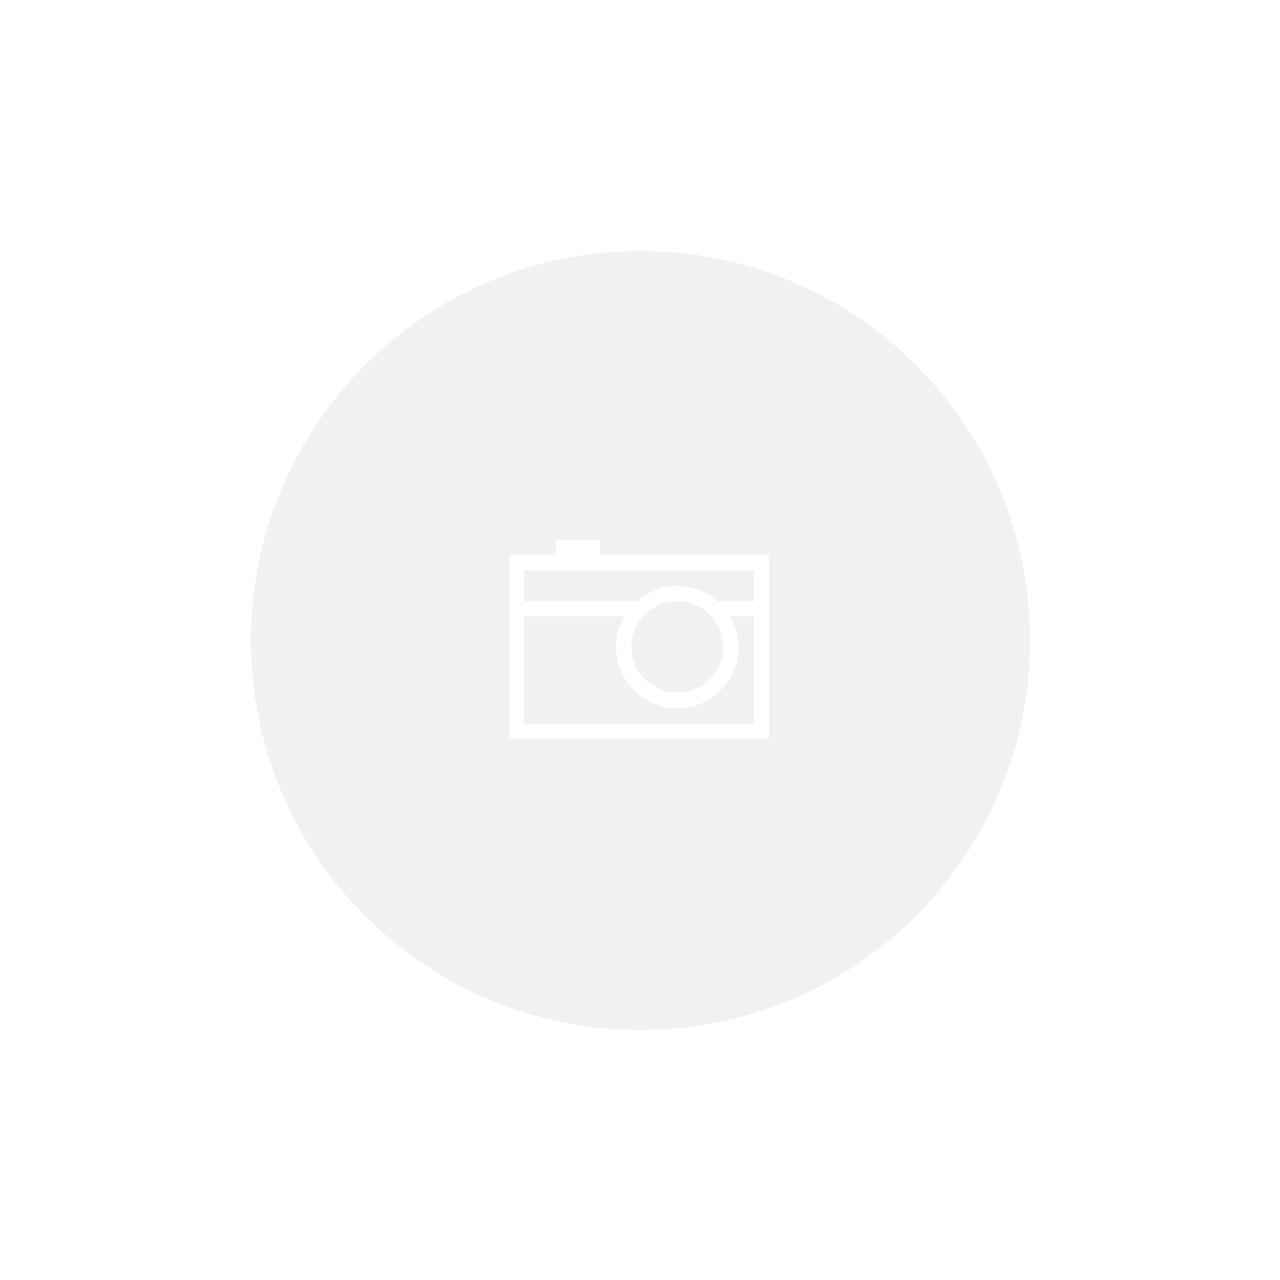 Blusa Onça Cardada 115IF17 Est 001